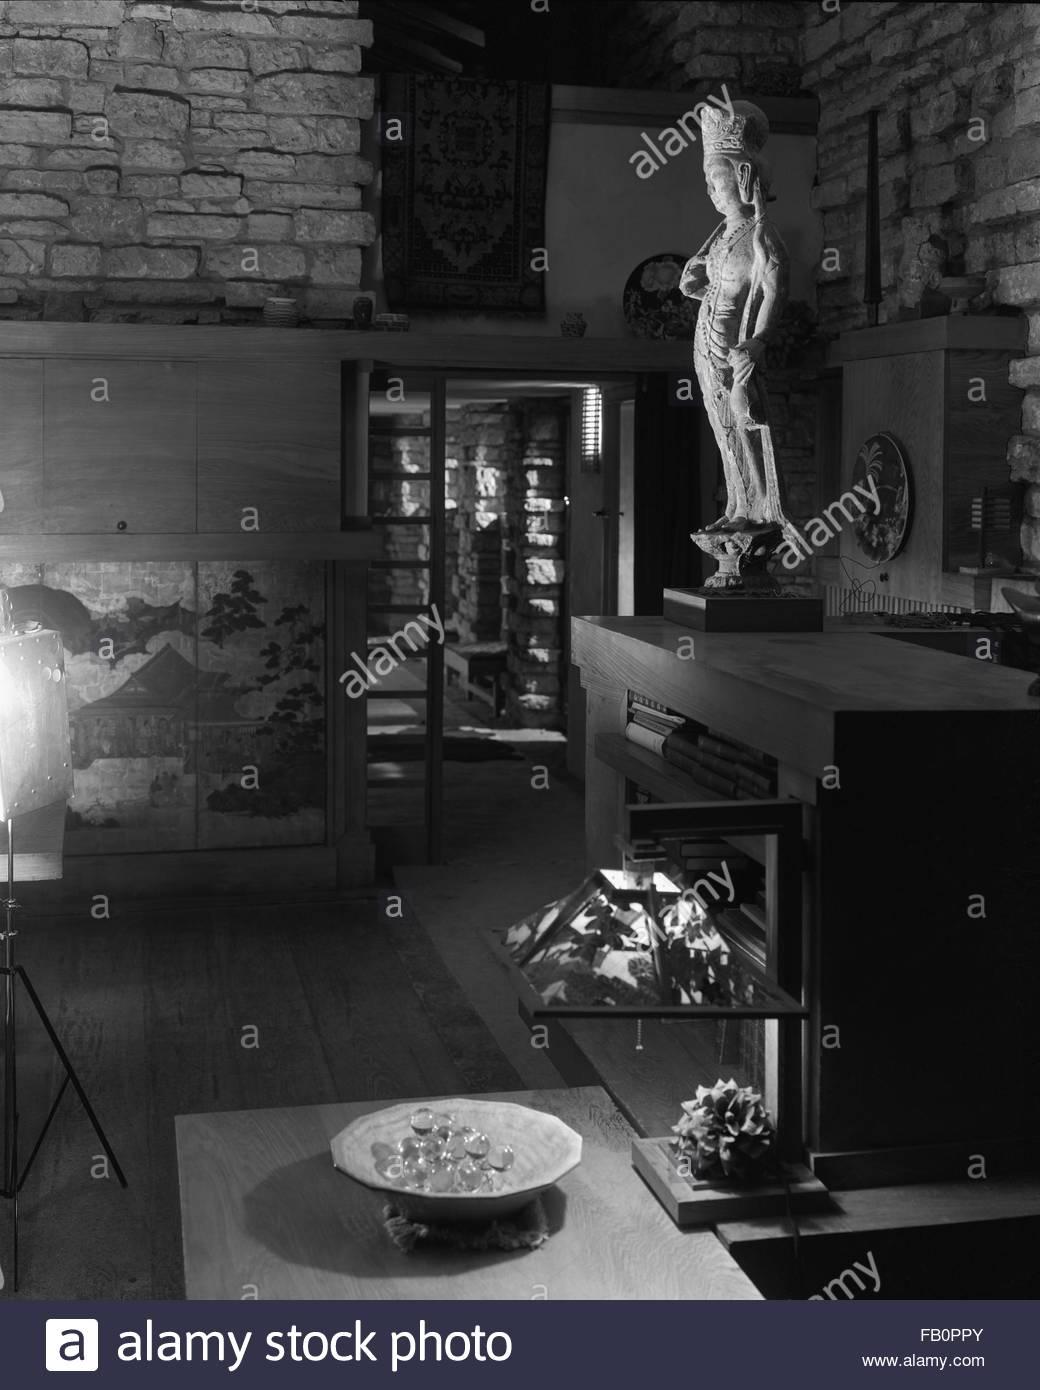 Taliesin East in Spring Green (Wis.), 1937 Dec. Sculpture in living room. - Stock Image